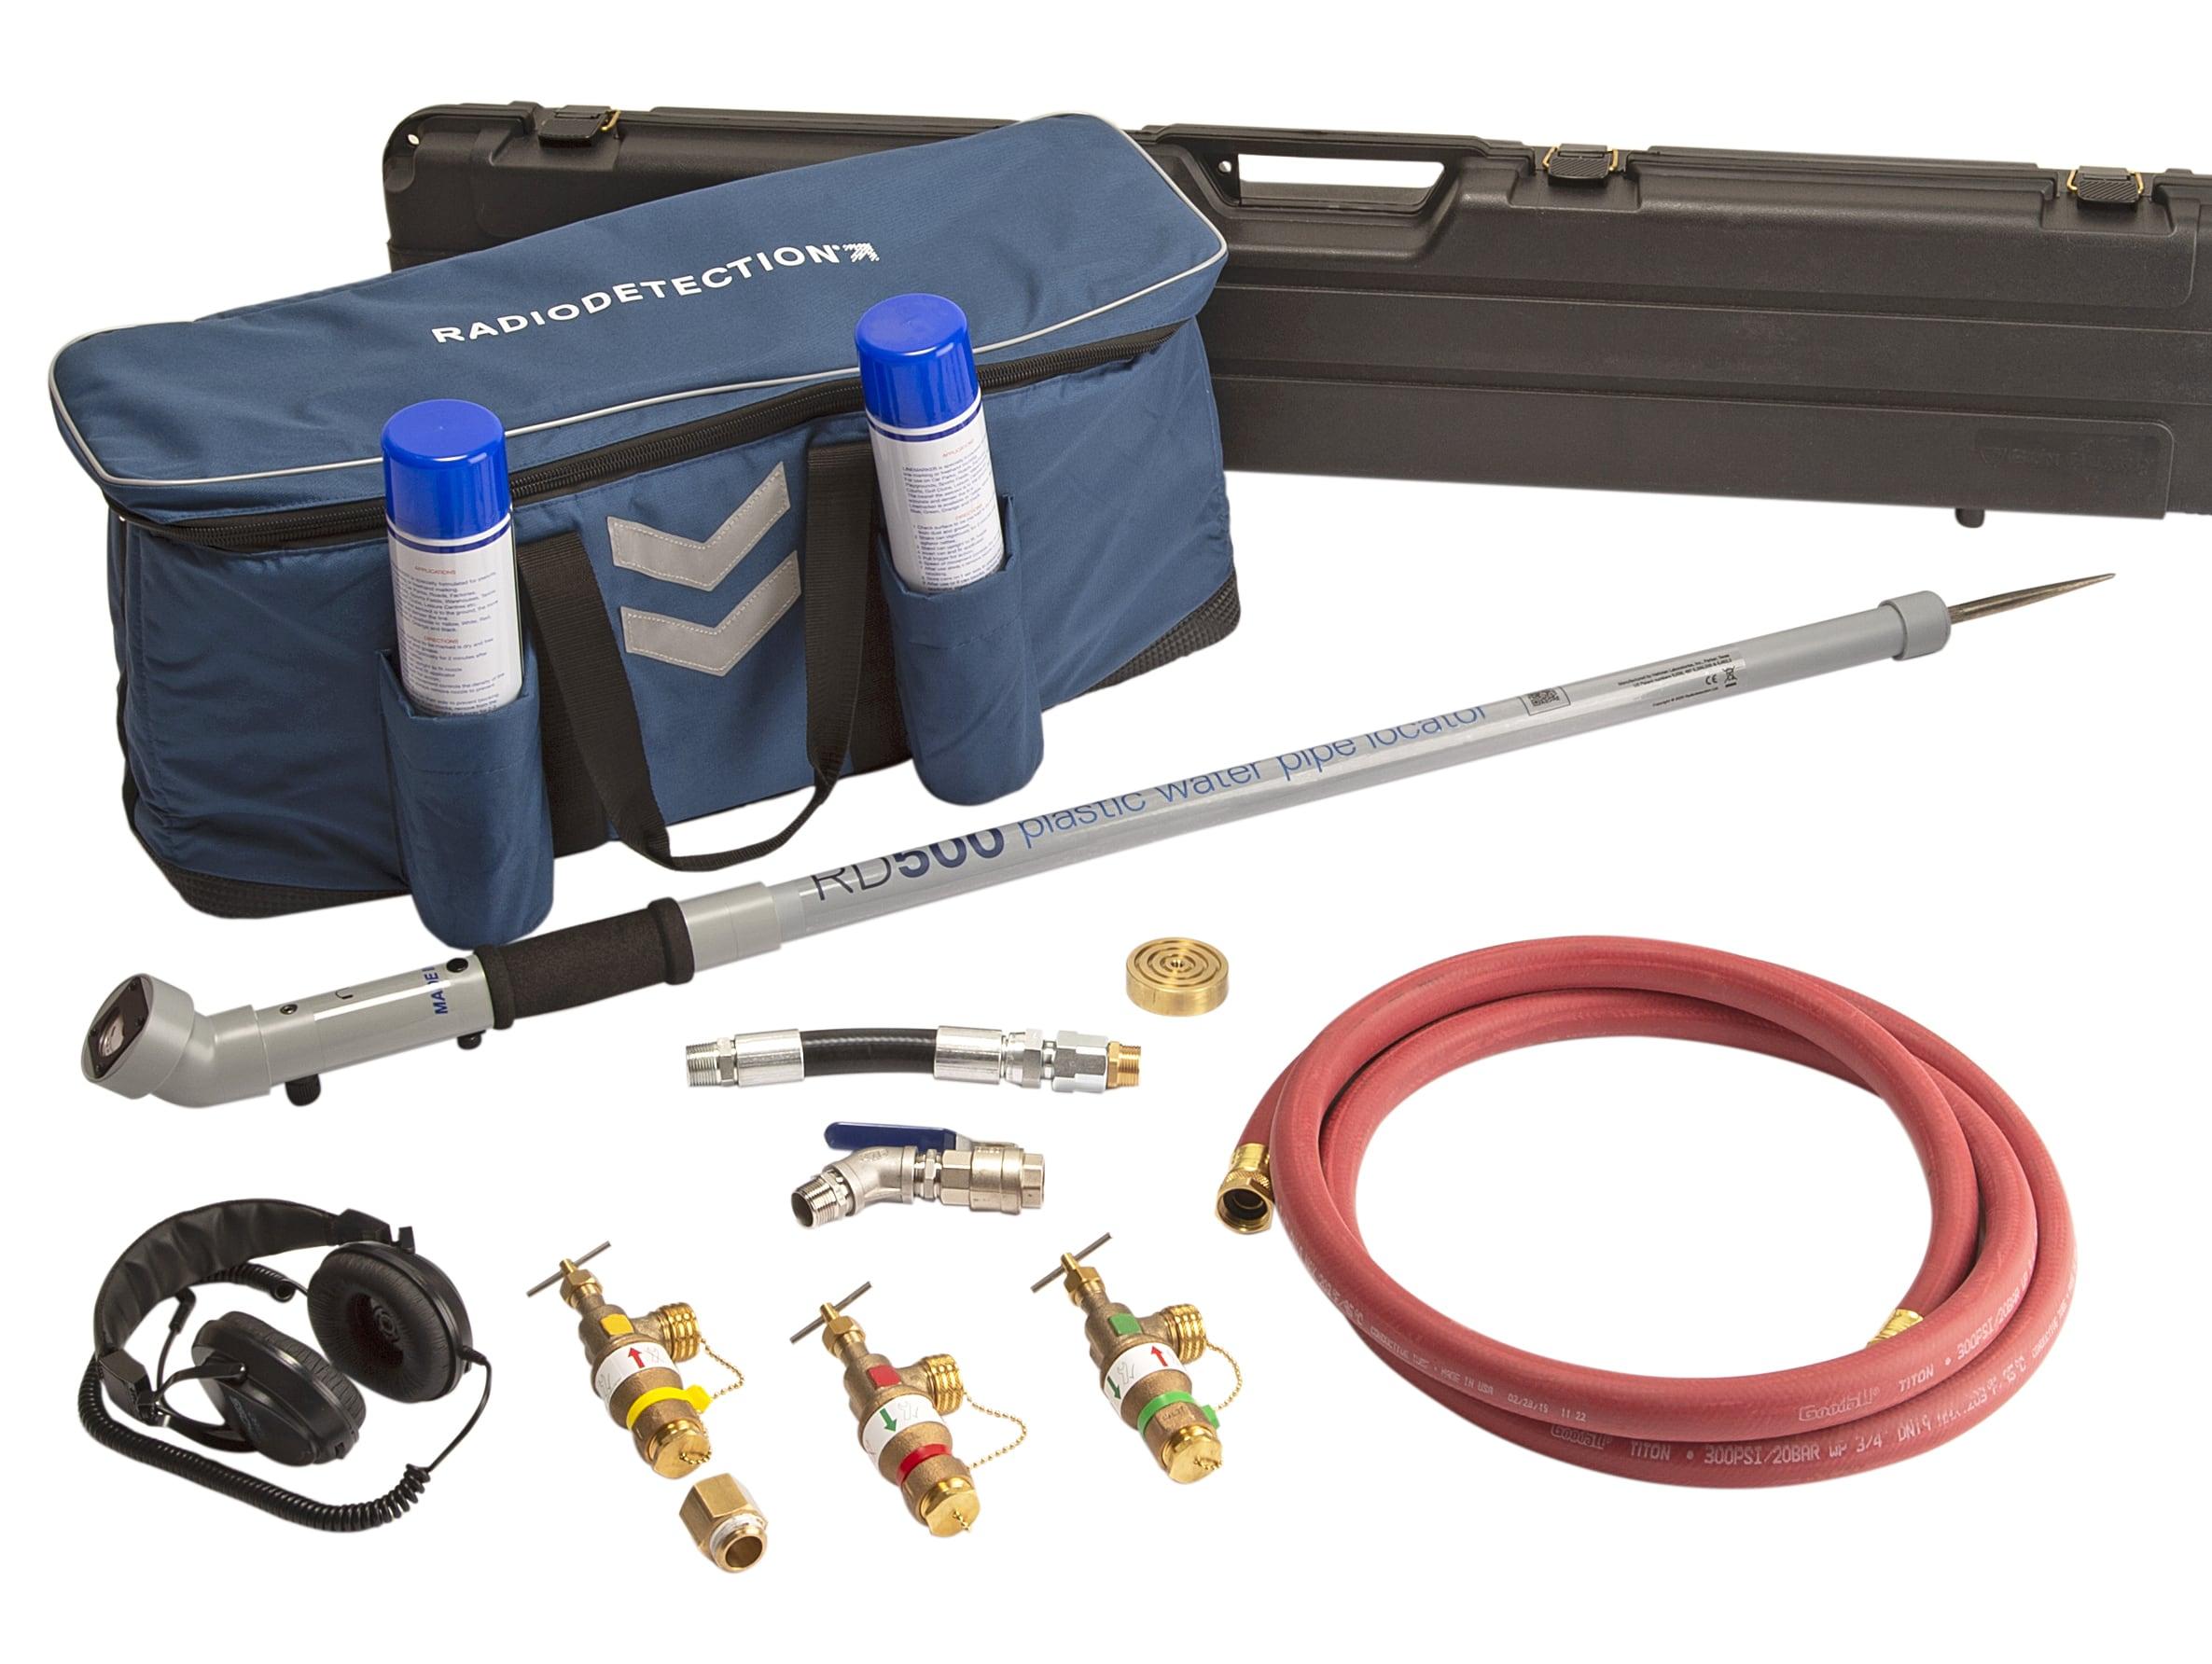 RD500 Mechanical Pulse Tx Kit Product Array